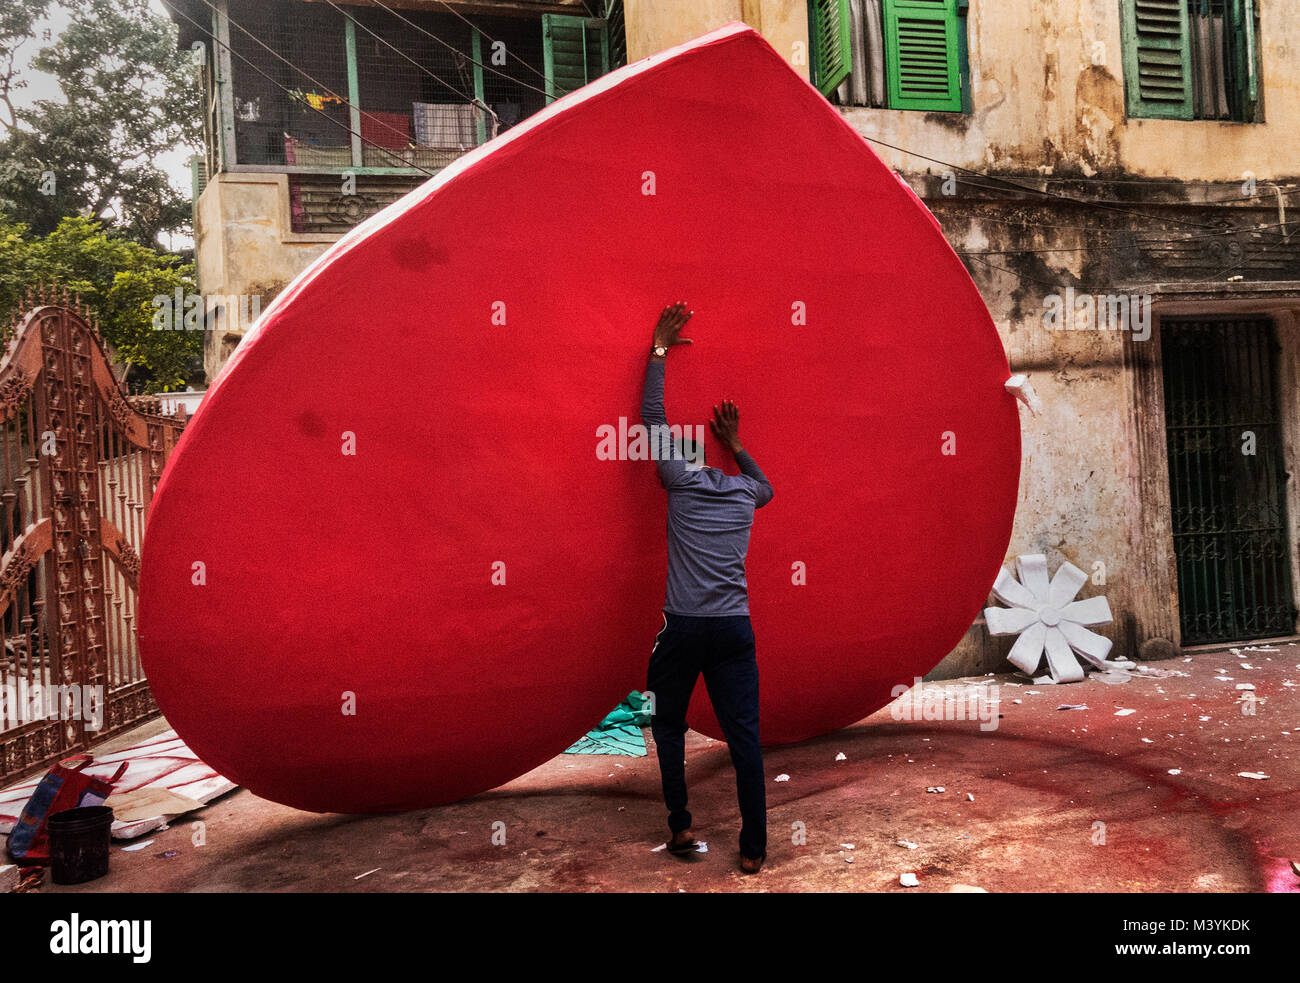 Kolkata. India. 13th Feb, 2018. An artist parepares decorative items for Valentine's Day in Kolkata, India on - Stock Image